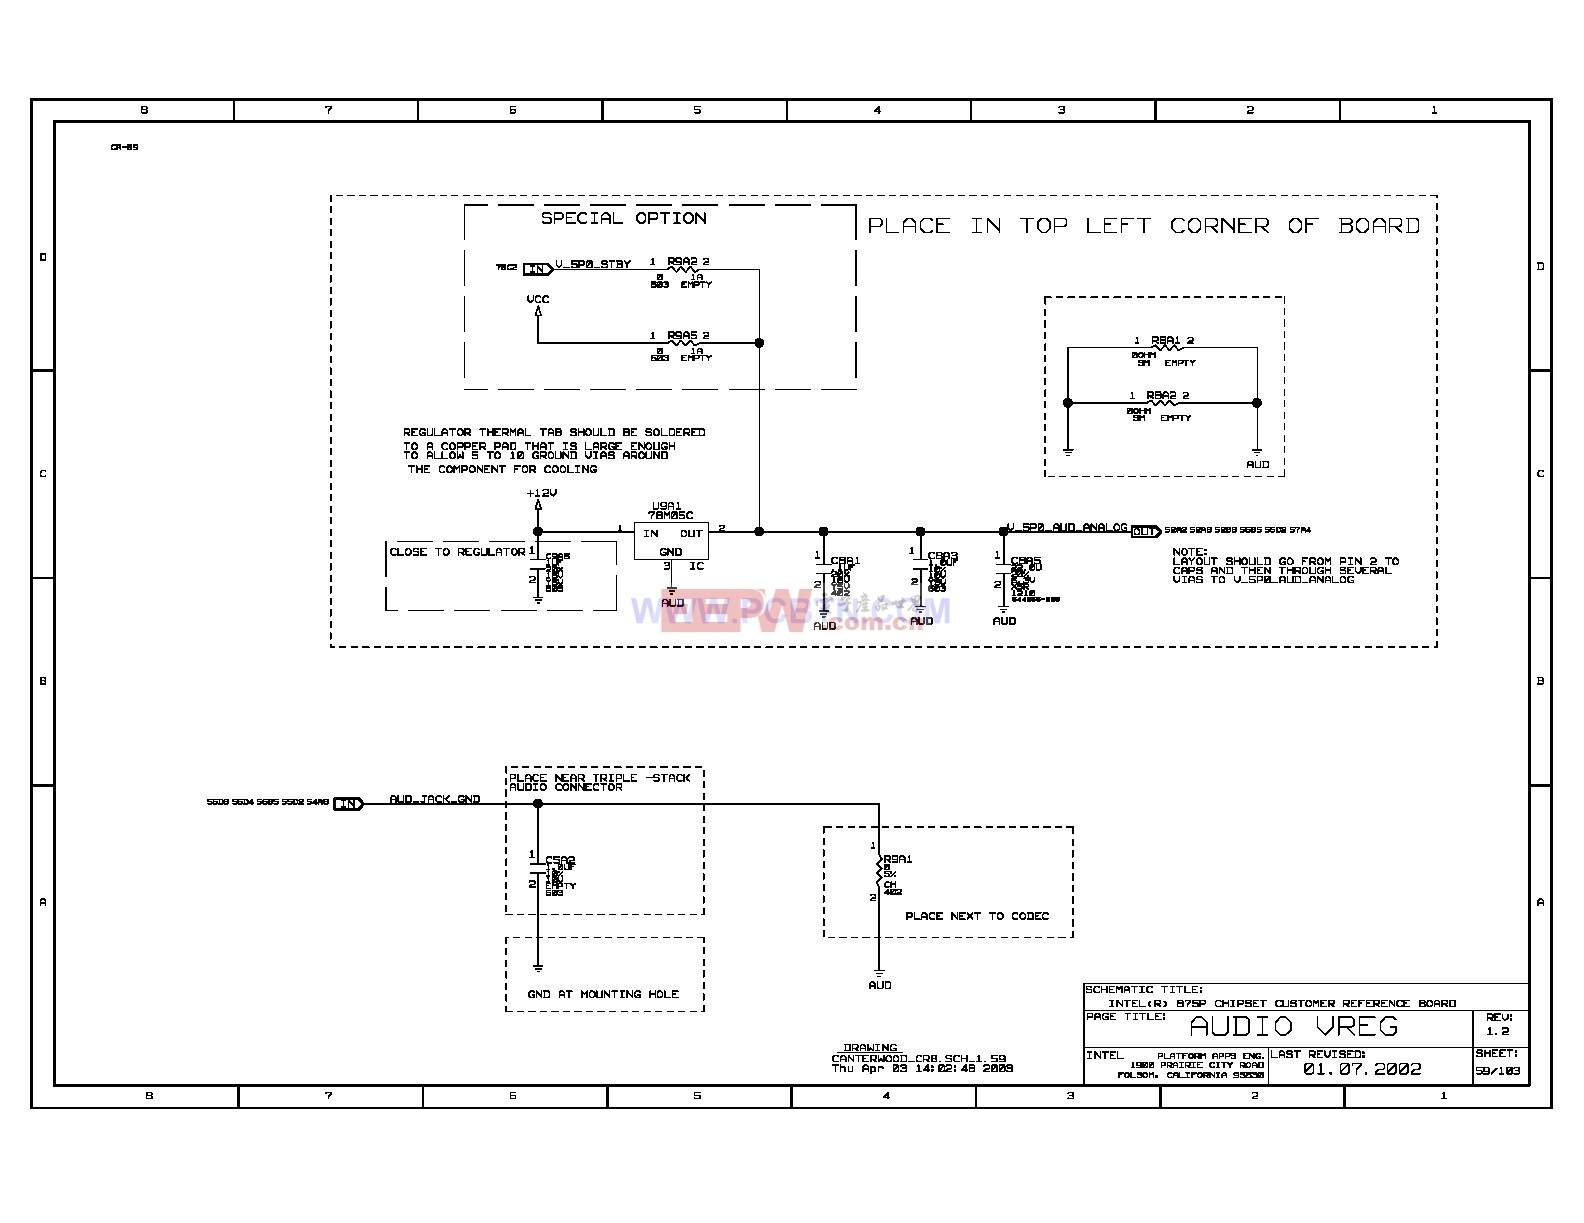 Intel 875p主板音频调整电压电路图